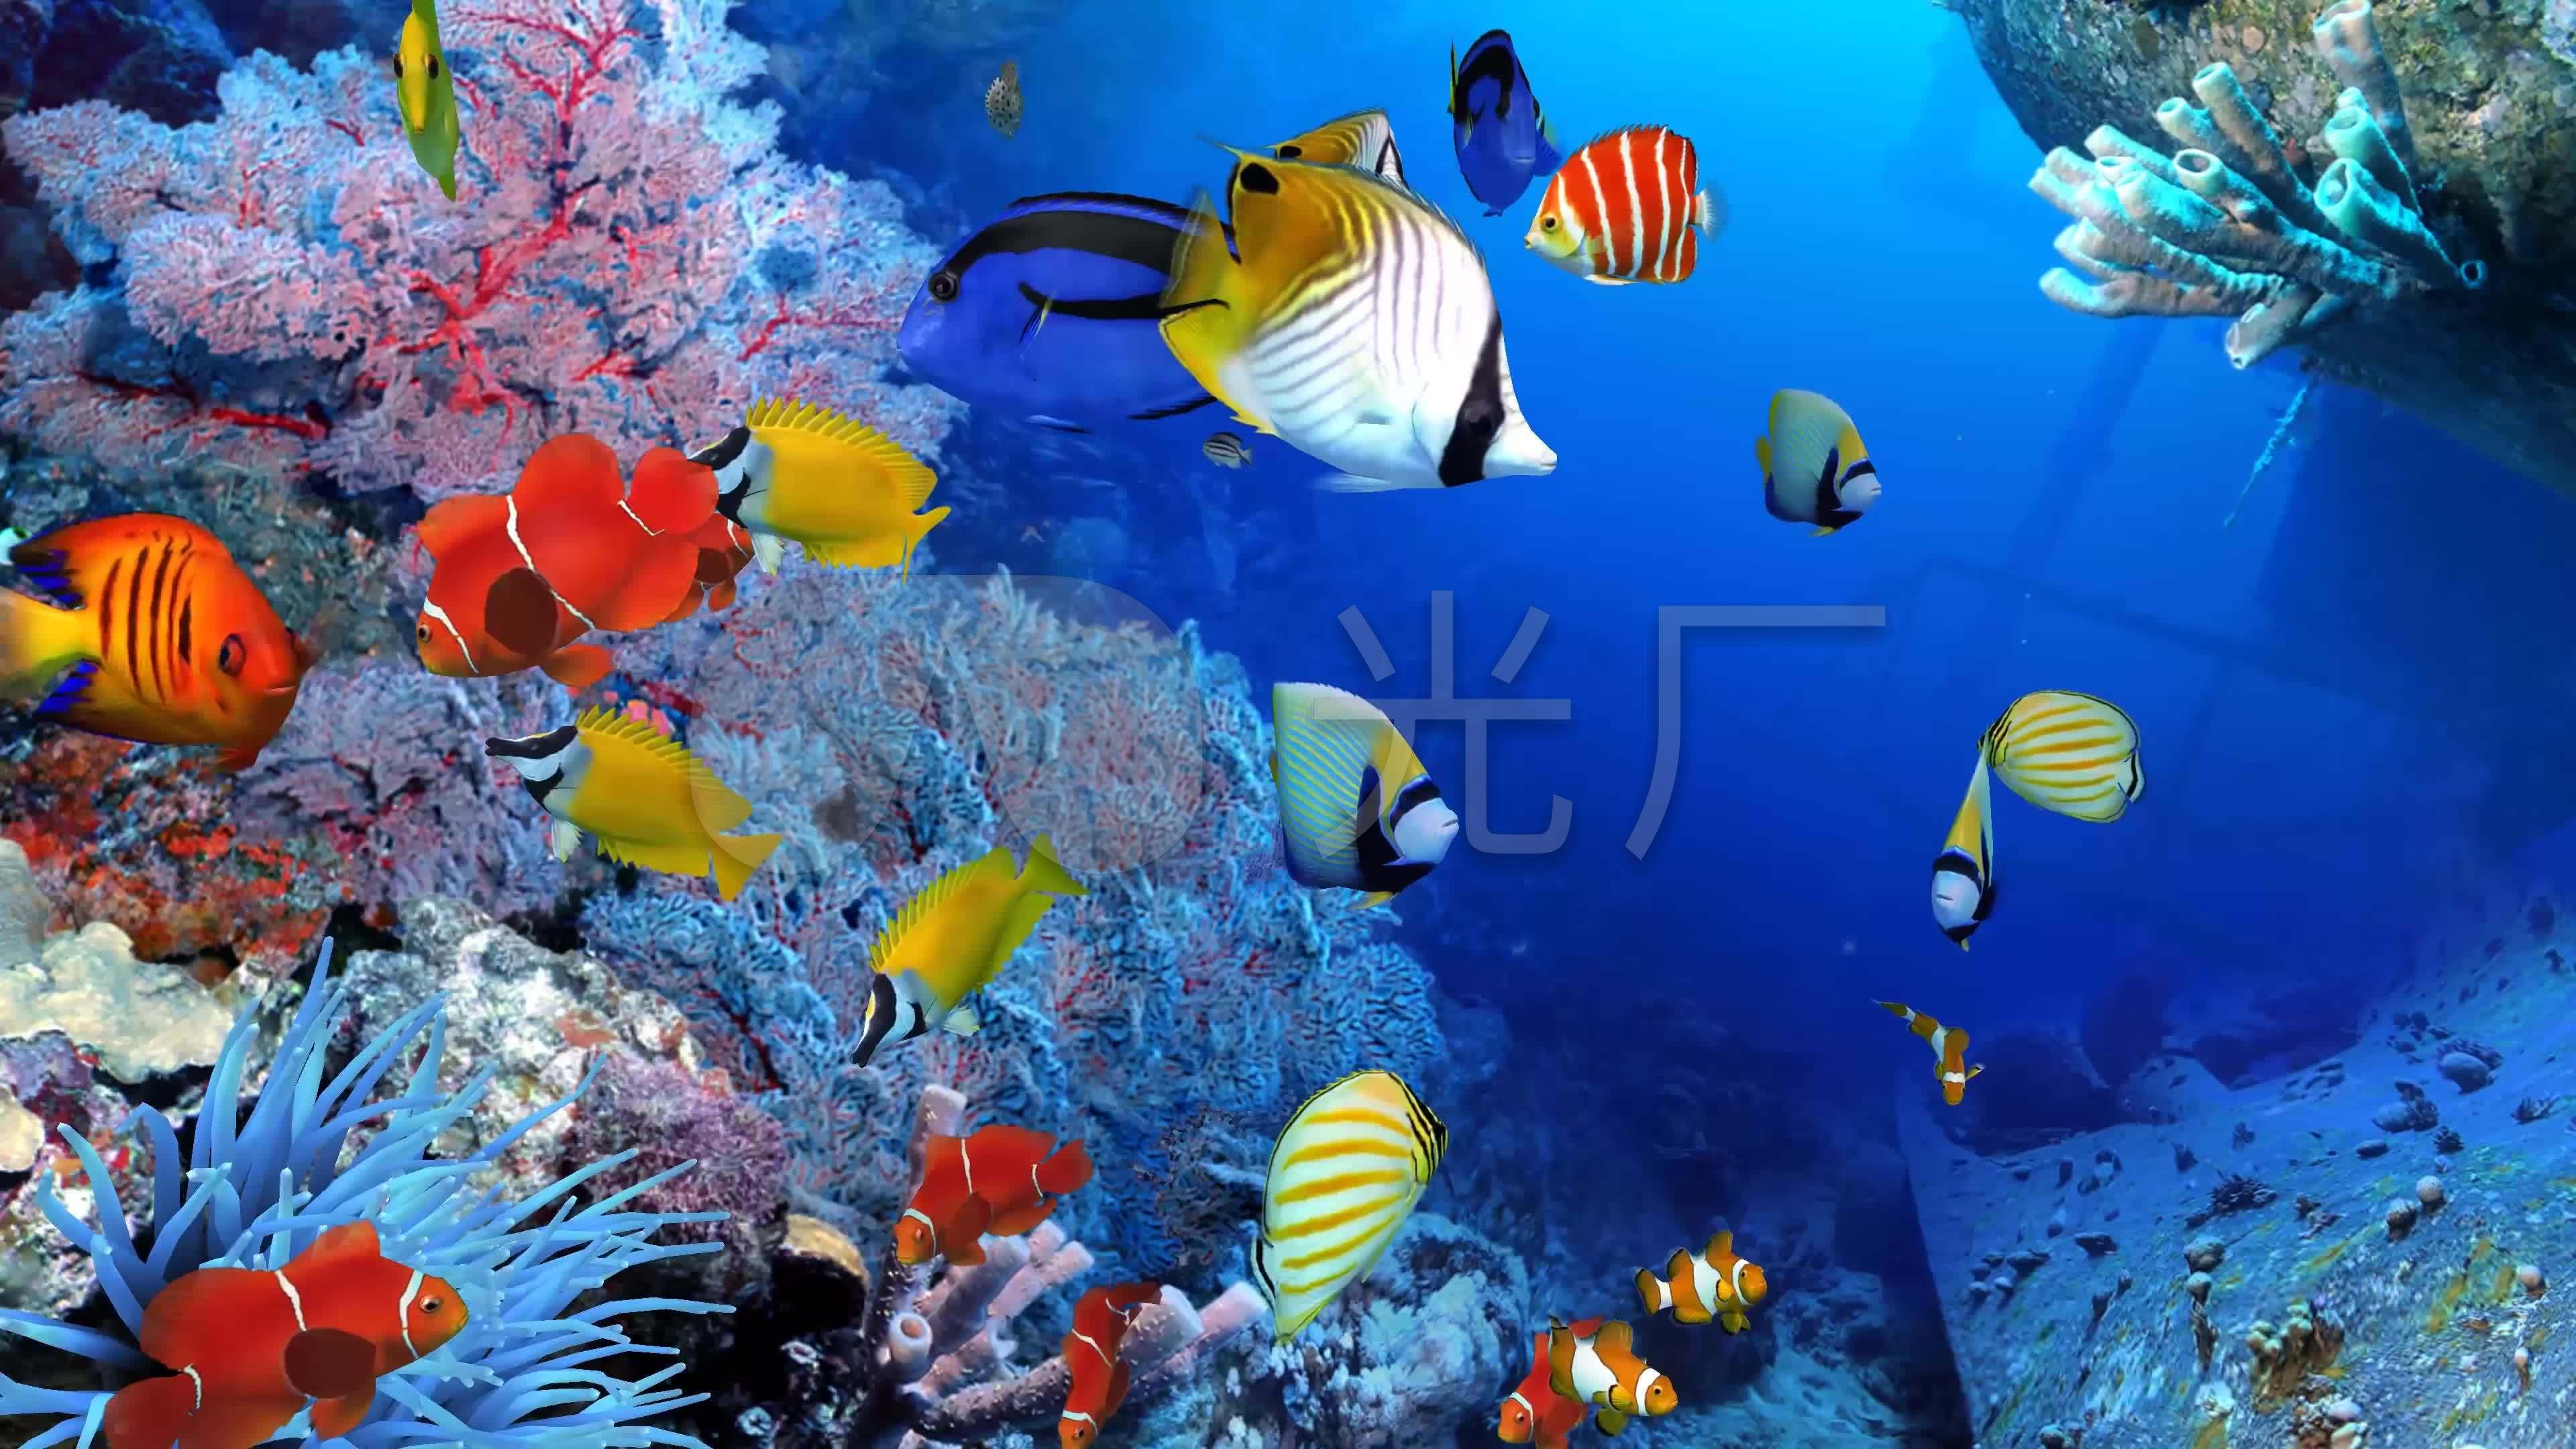 4k三维3d海底世界水族馆海洋海底鱼群_3840x2160_高清